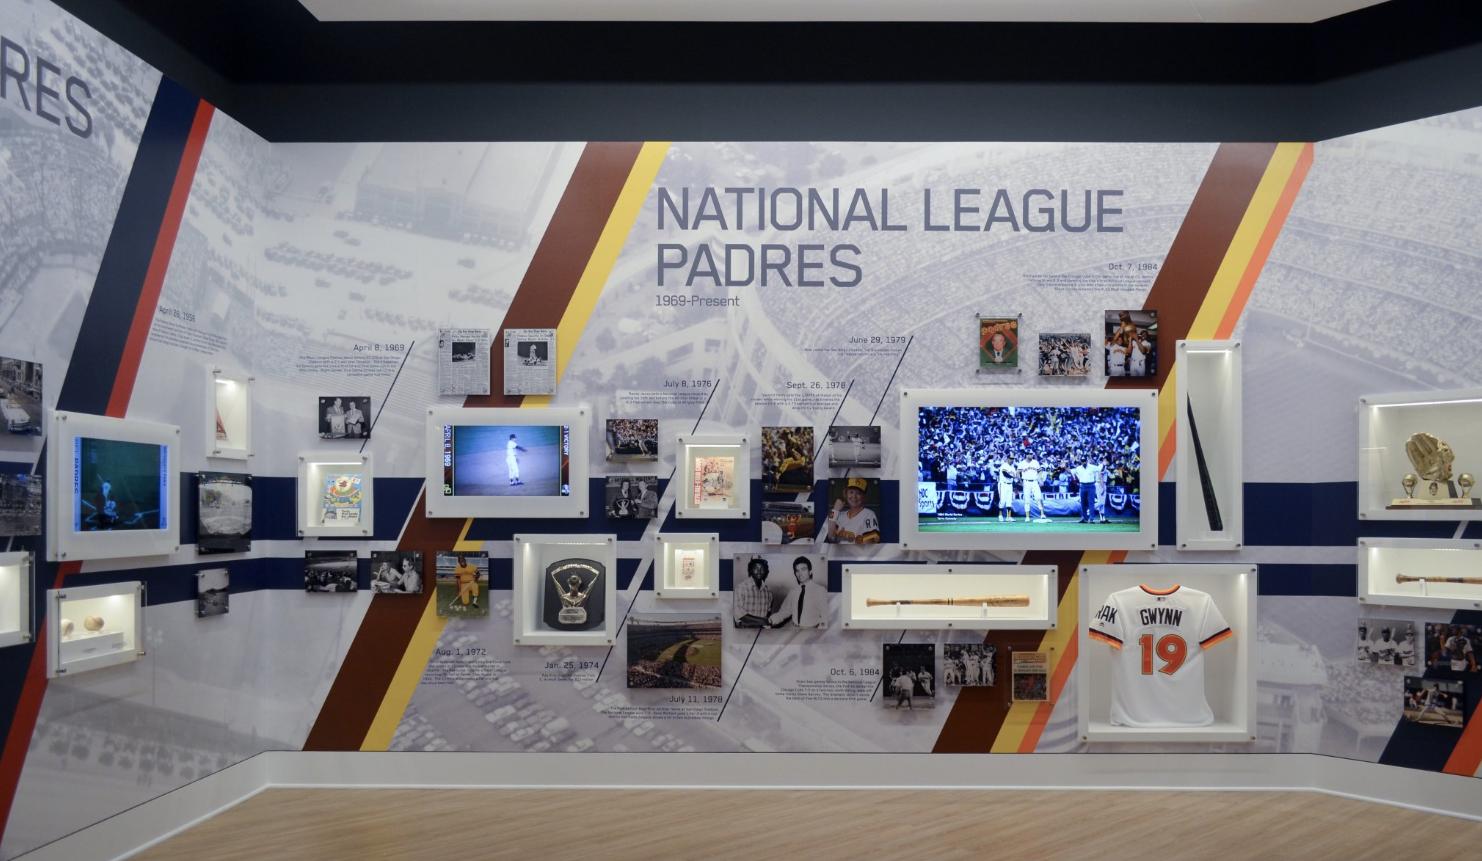 ArtisanHD provides Large Format Digital Printing for San Diego Padres Hall of Fame